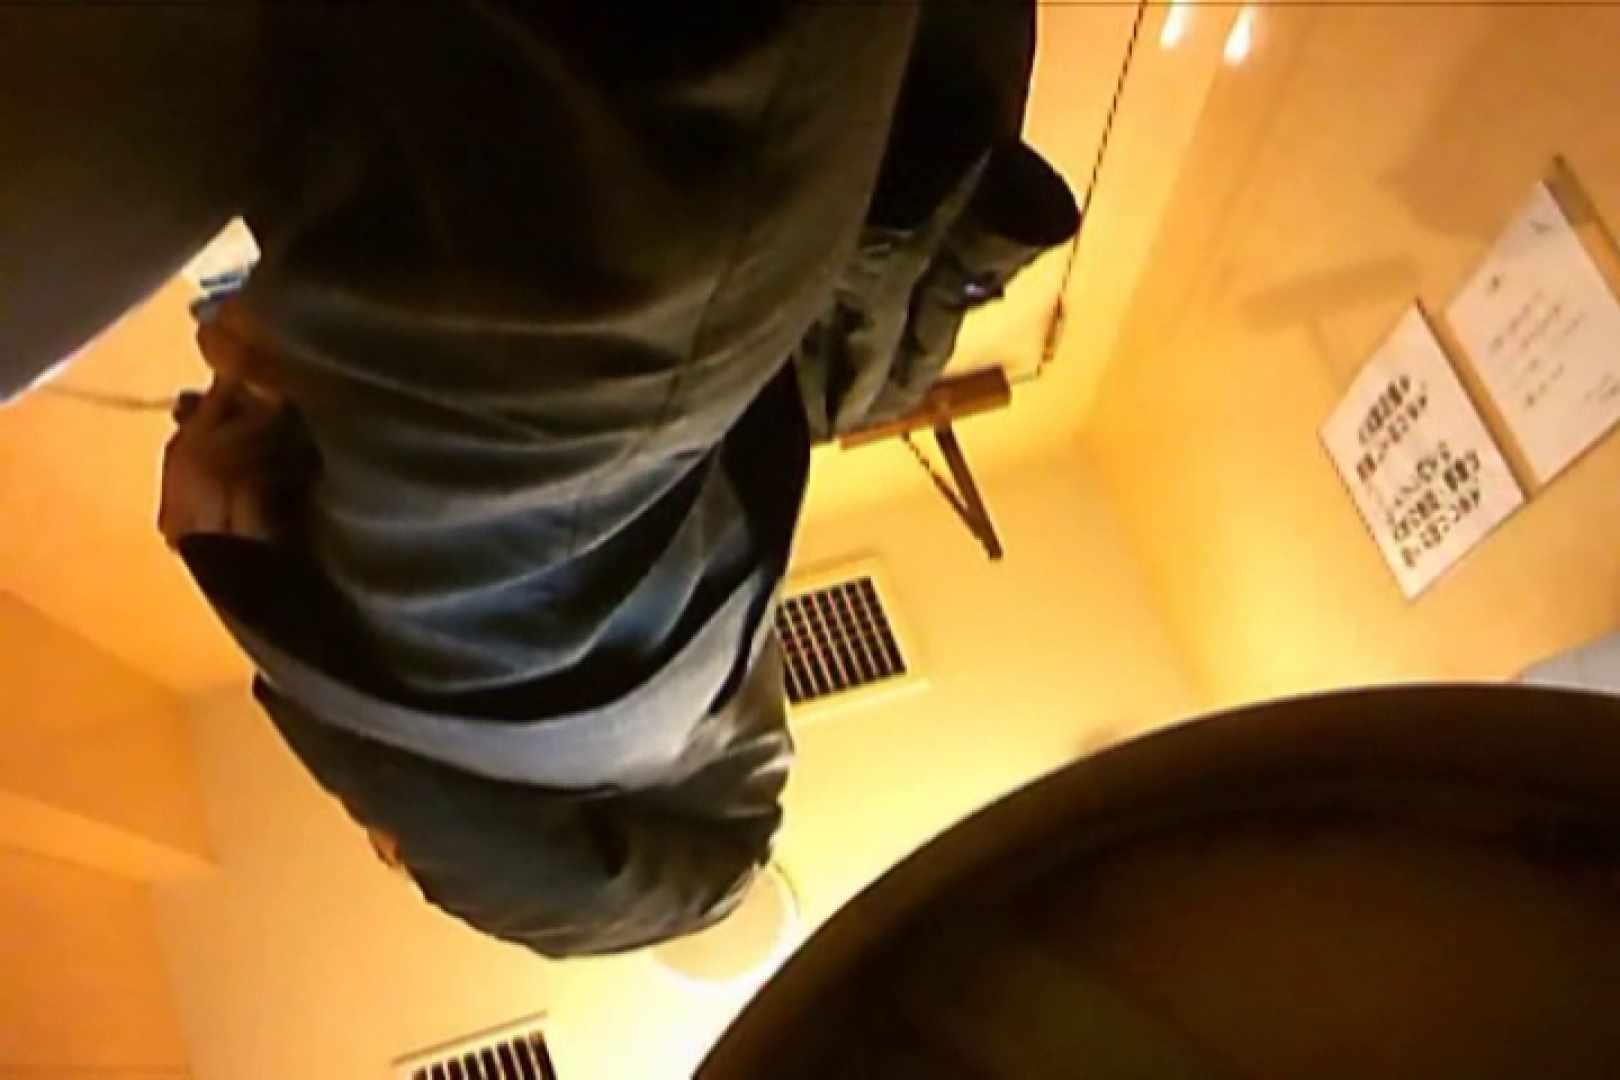 SEASON 2ND!掴み取りさんの洗面所覗き!in新幹線!VOL.13 リーマン系メンズ 男同士動画 13画像 9